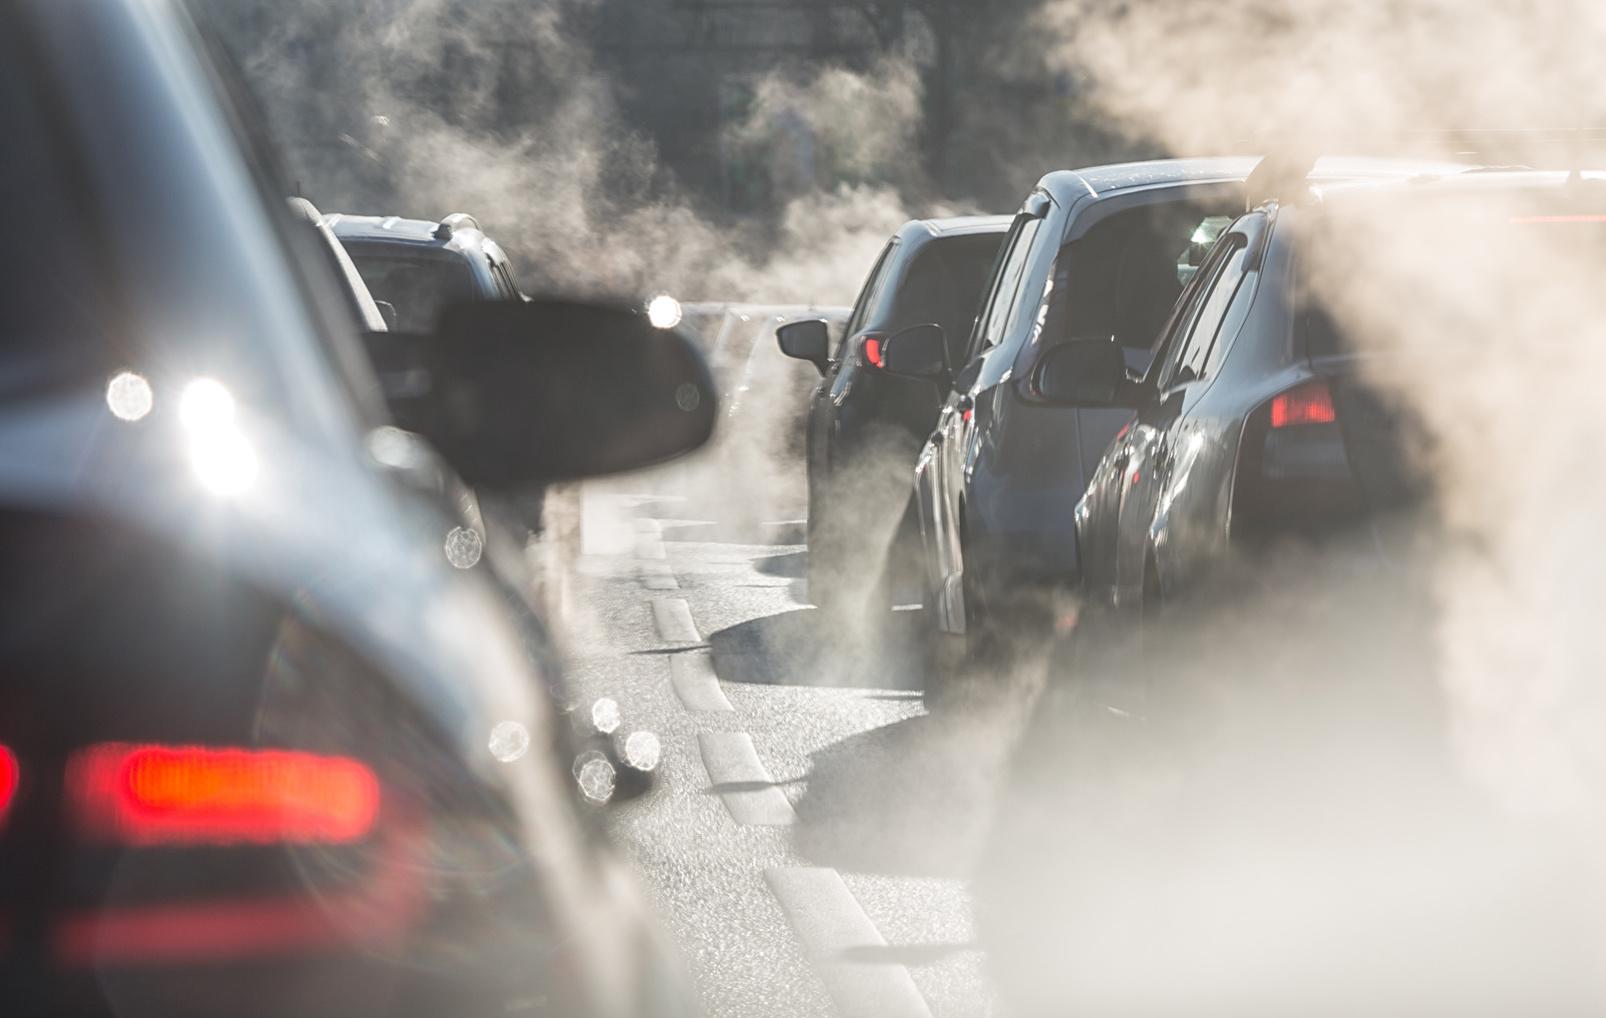 multe emissioni auto normative europee